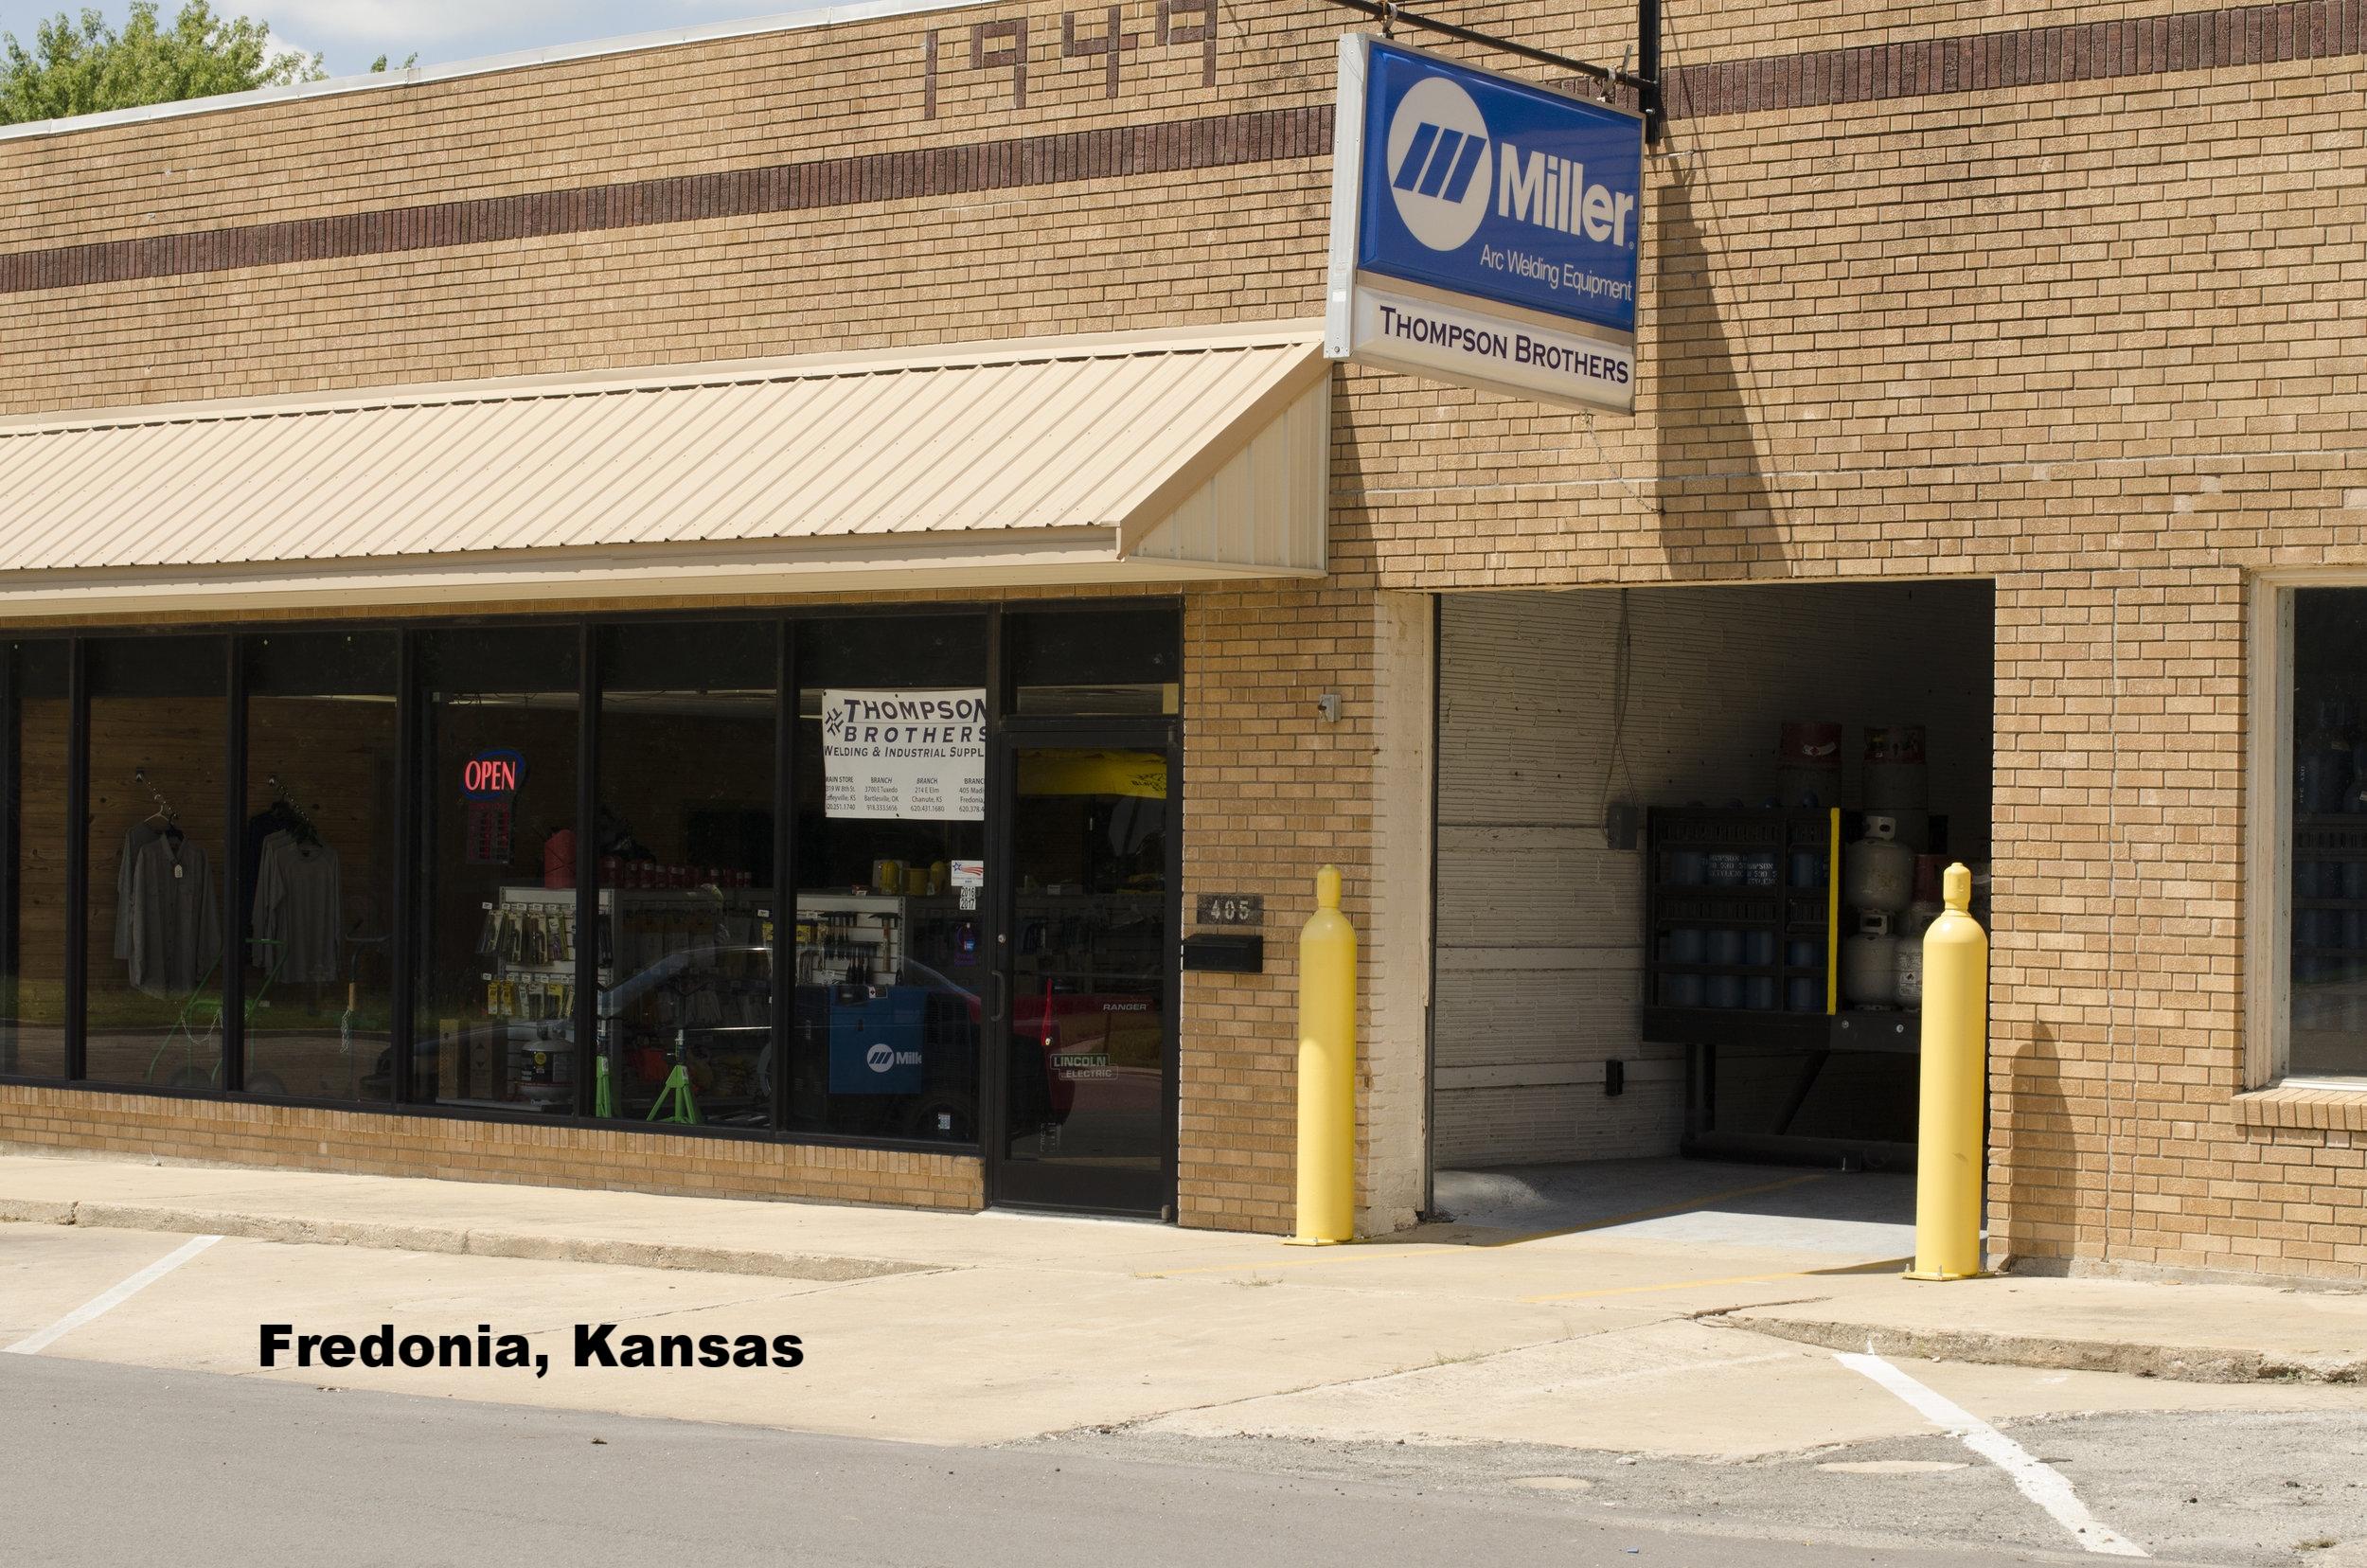 Fredonia Store